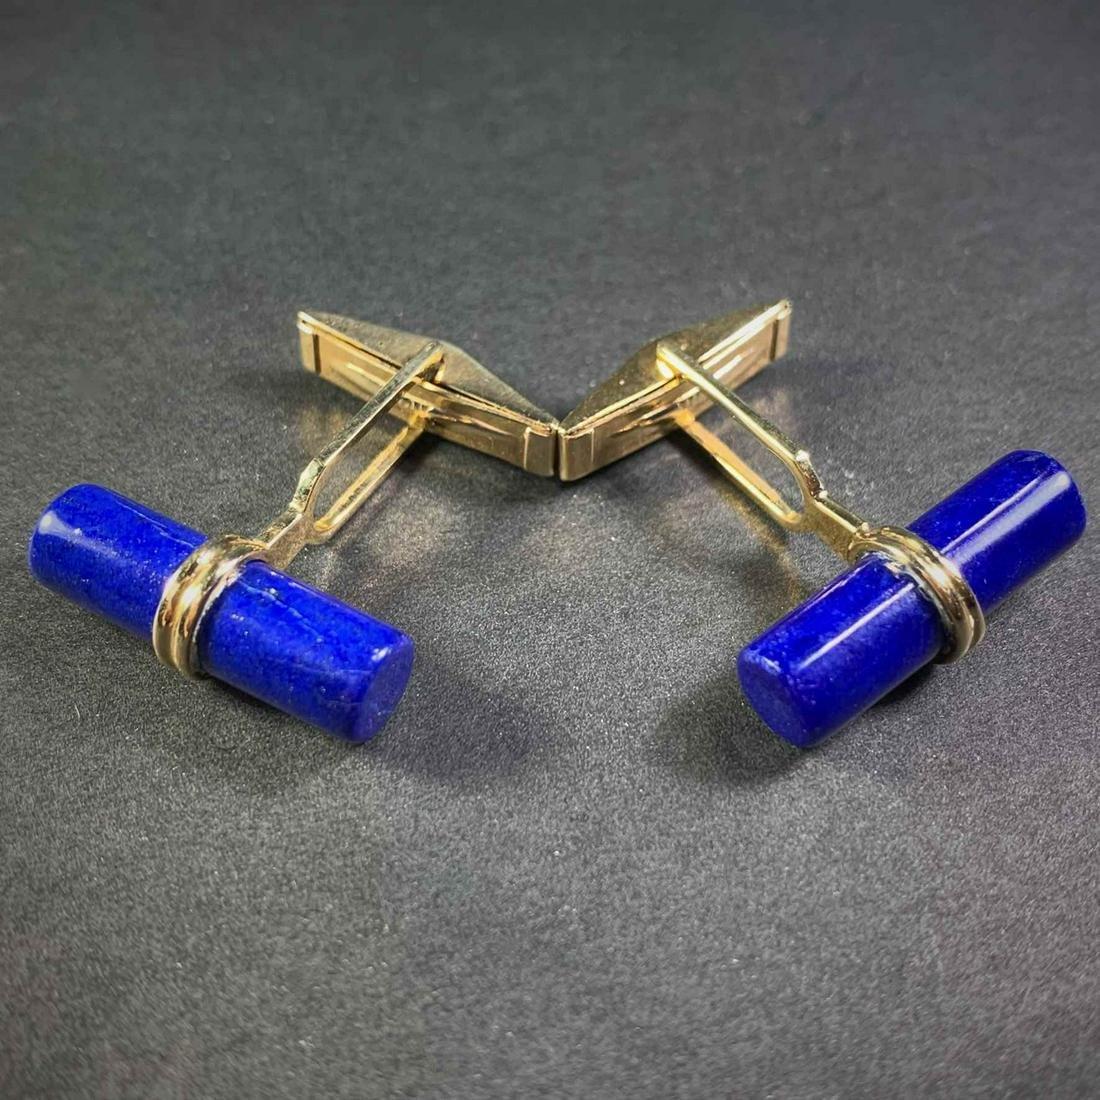 Pair Lapis Lazuli 14K Yellow Gold Cufflinks